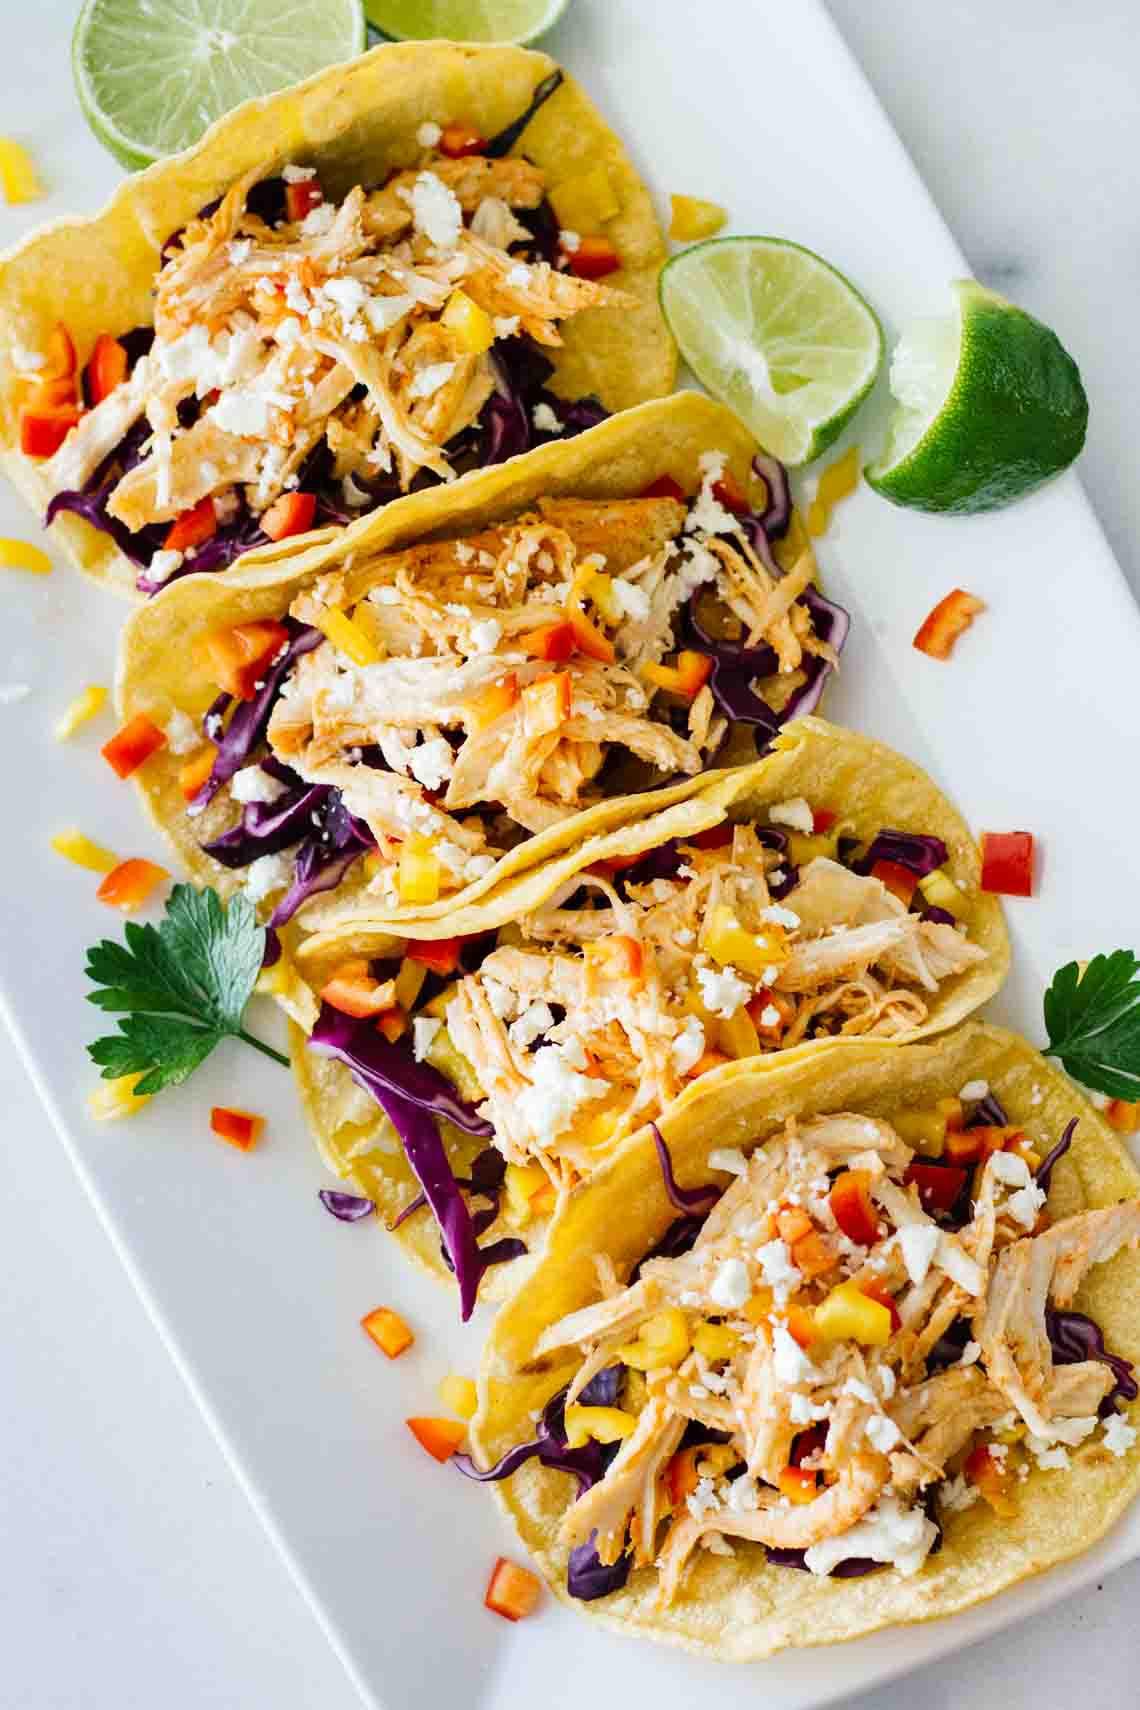 Healthy Meals For Dinner  Healthy Sriracha Shredded Chicken Tacos Jar Lemons